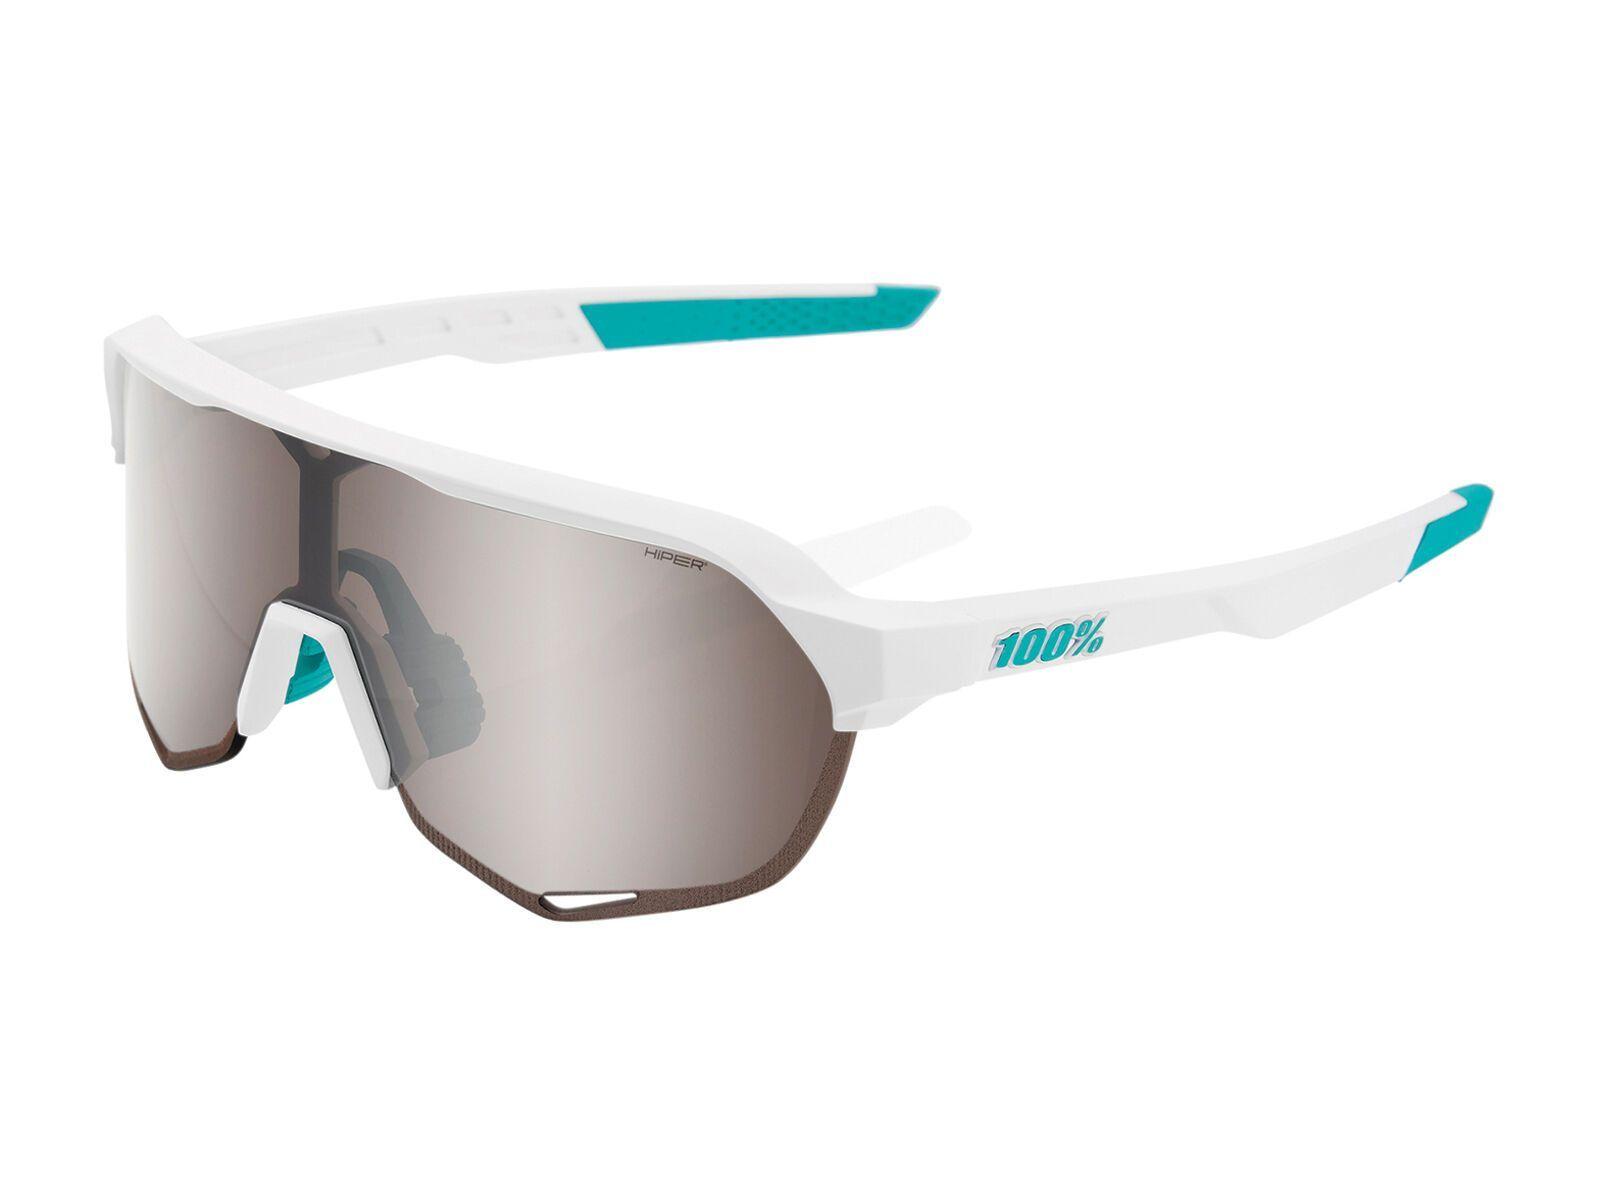 100% S2 SE BORA - hansgrohe - HIPER Silver ML Mir team white HU-GLA-1117/1216/unis